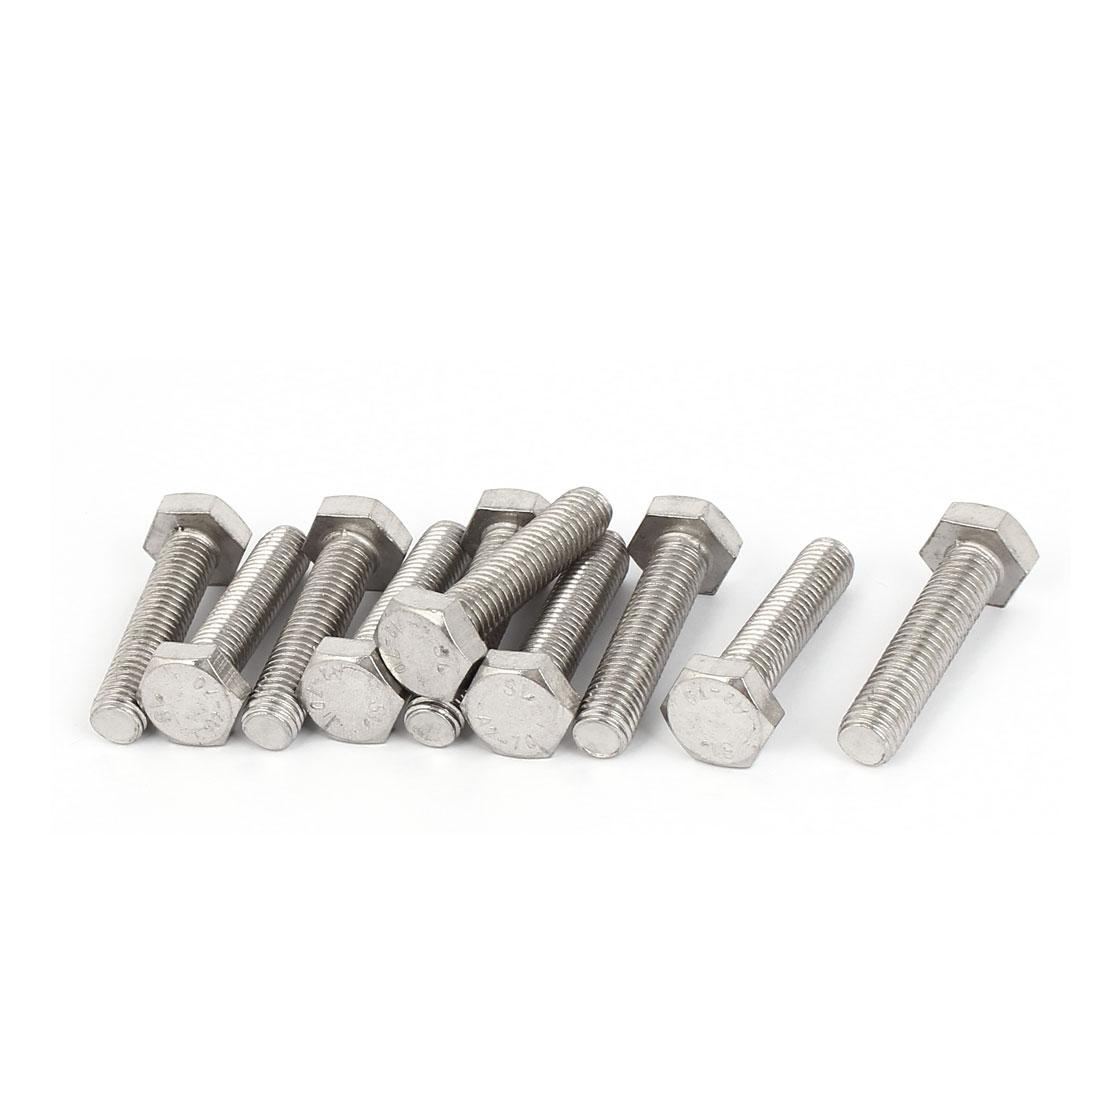 M10 x 45mm 1.5mm Pitch Fully Thread Hex Hexagon Screws Bolts DIN 933 10PCS